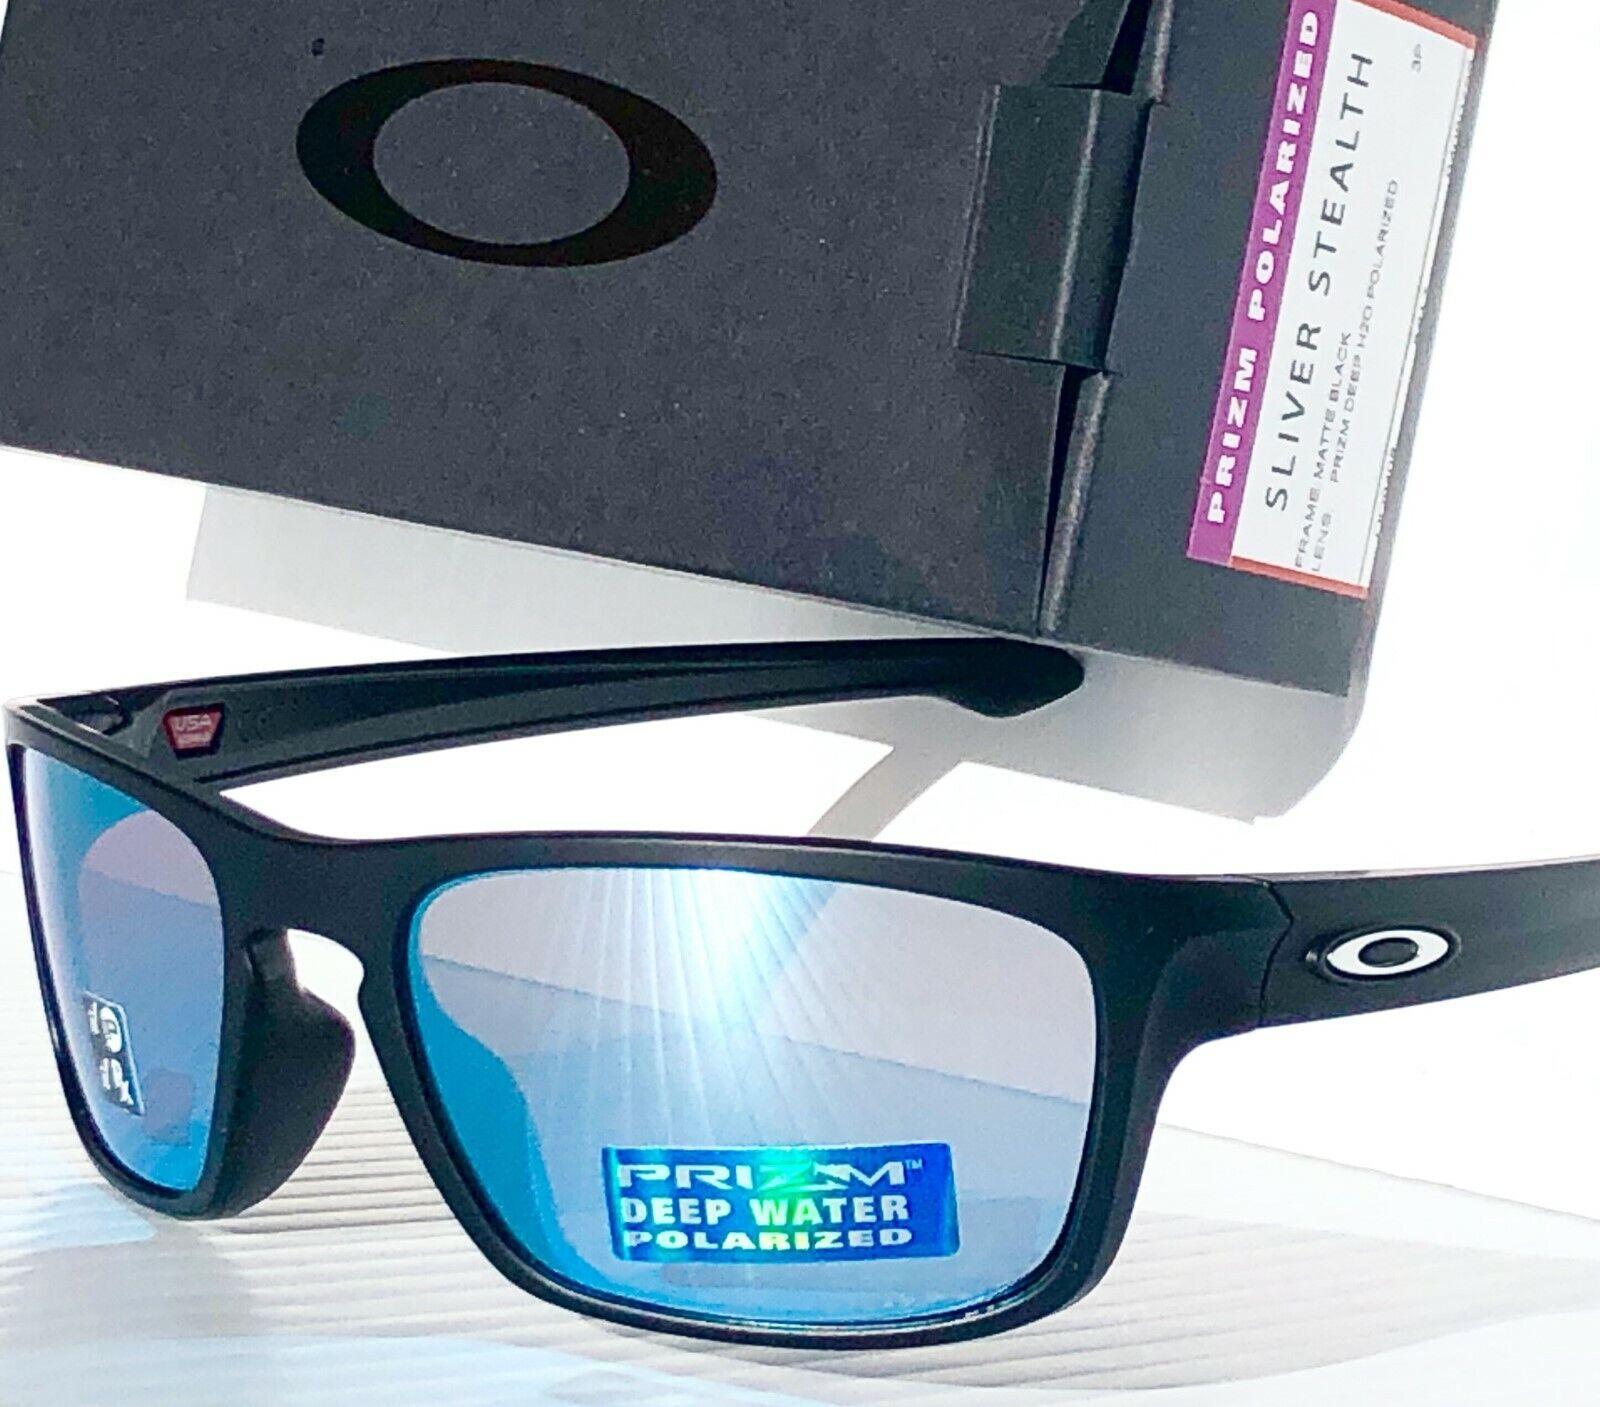 NEW* Oakley SLIVER STEALTH Black POLARIZED Deep Water PRIZM Sunglass H2O 9408-07